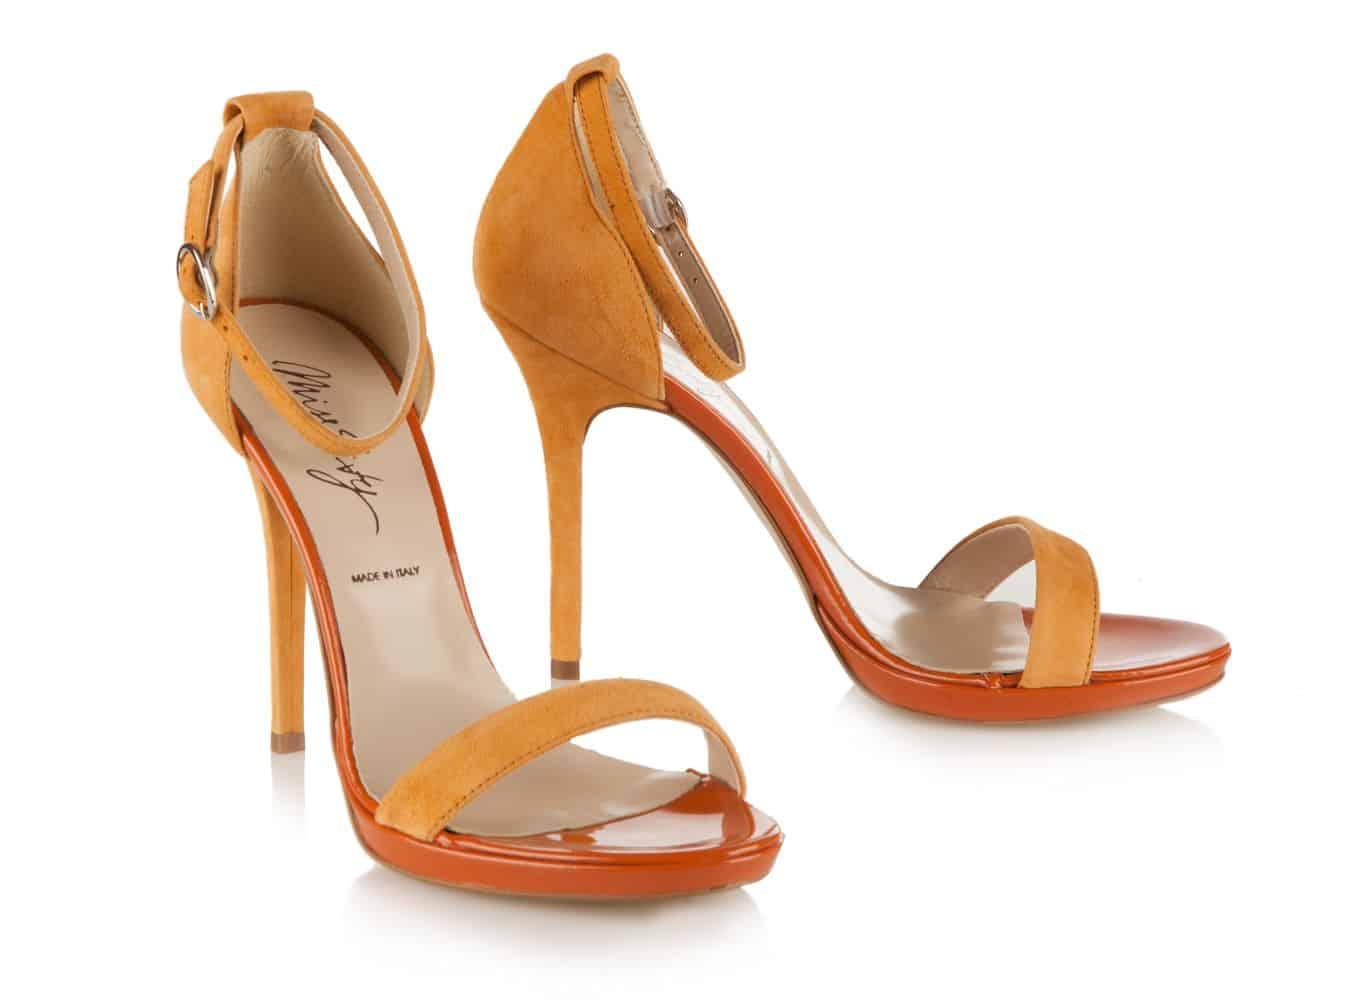 Miss Sixty Lisa arancio chiaro e arancio scuro 139.00 euro